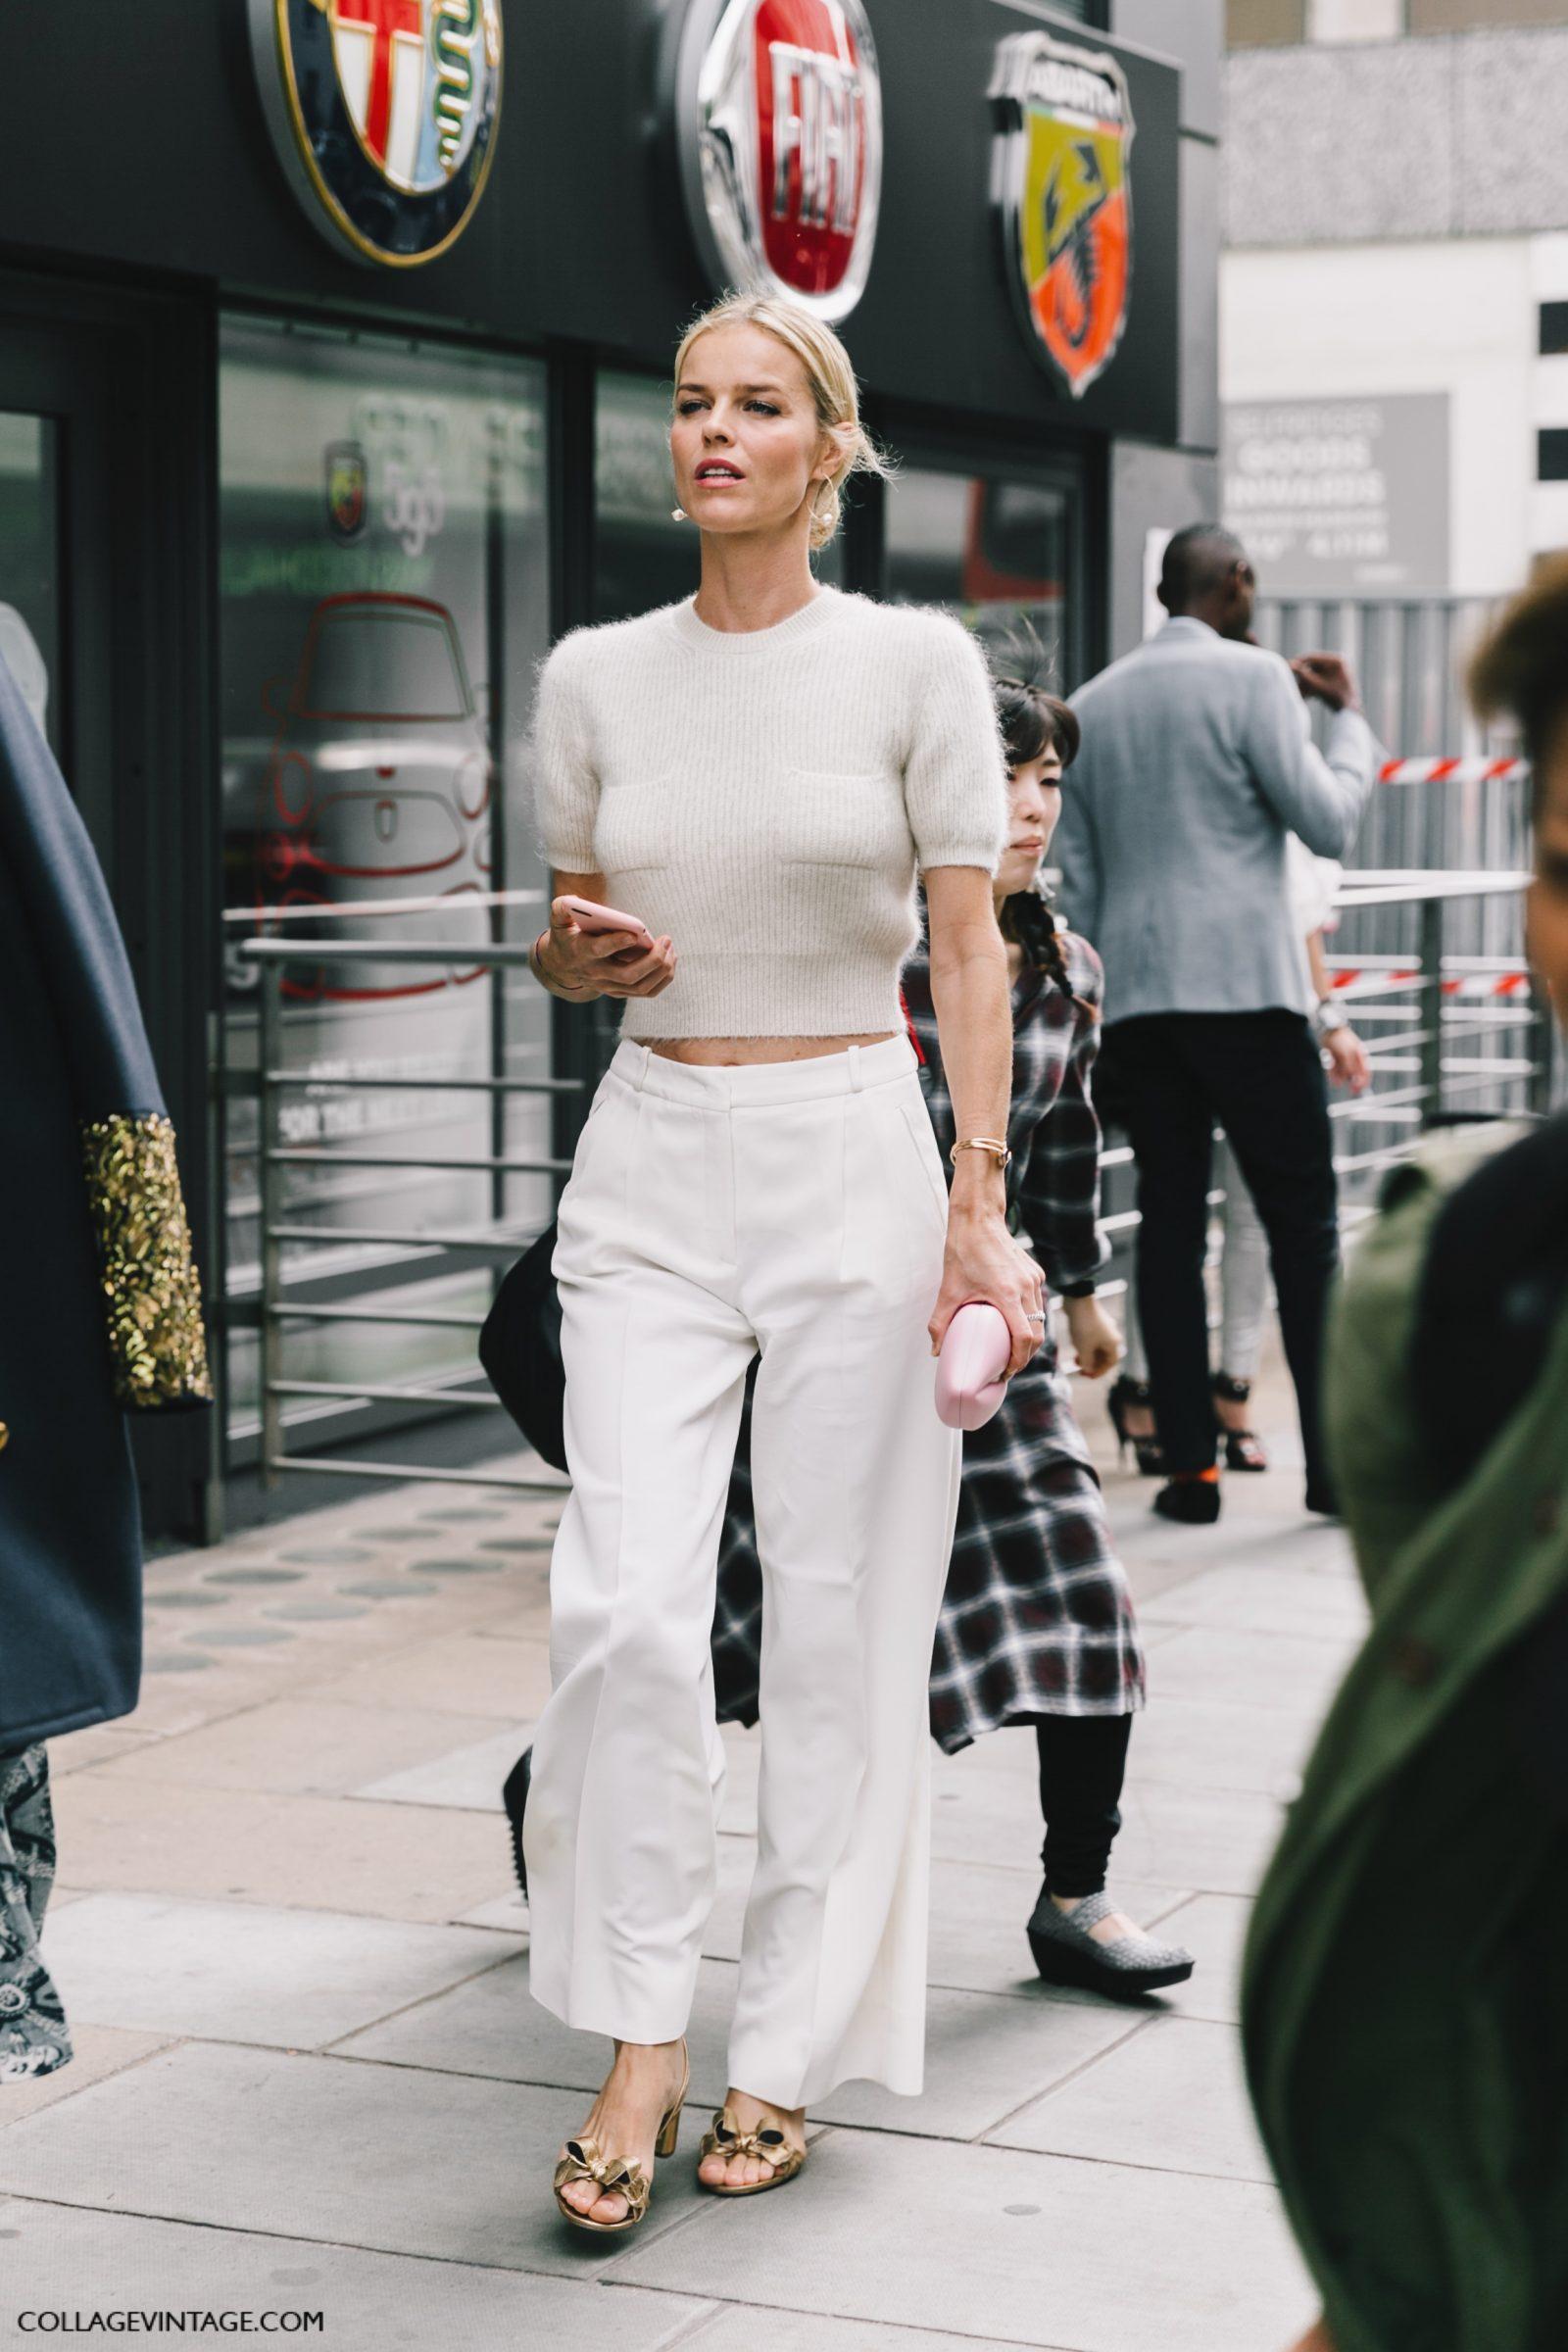 lfw-london_fashion_week_ss17-street_style-outfits-collage_vintage-vintage-roksanda-christopher_kane-joseph-32